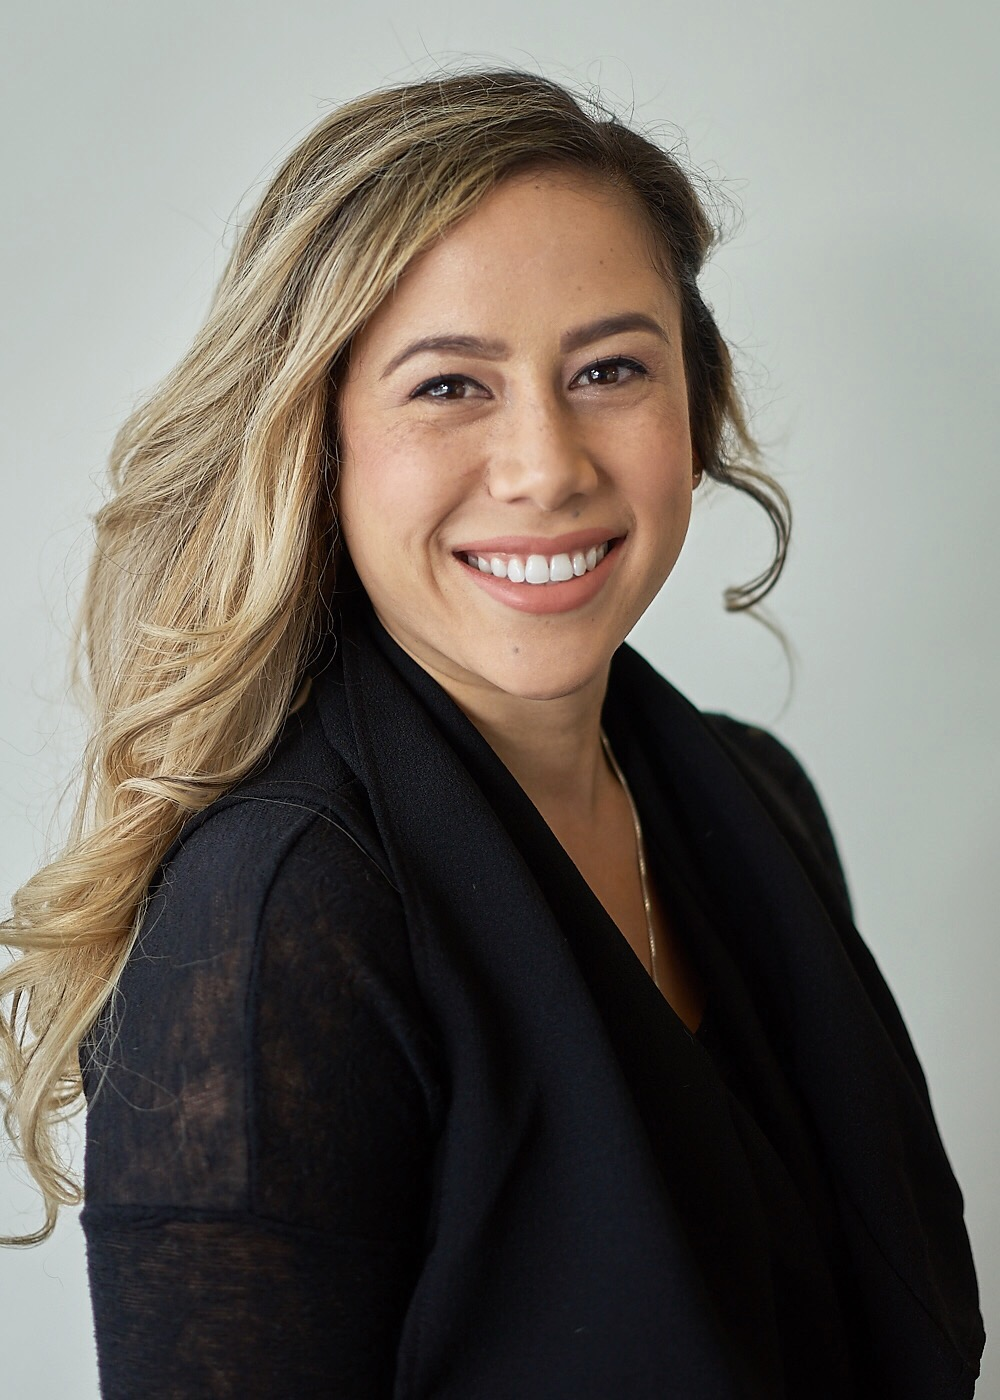 Meet Maya, a registered dental hygienist at Tanega Dental in South San Francisco.